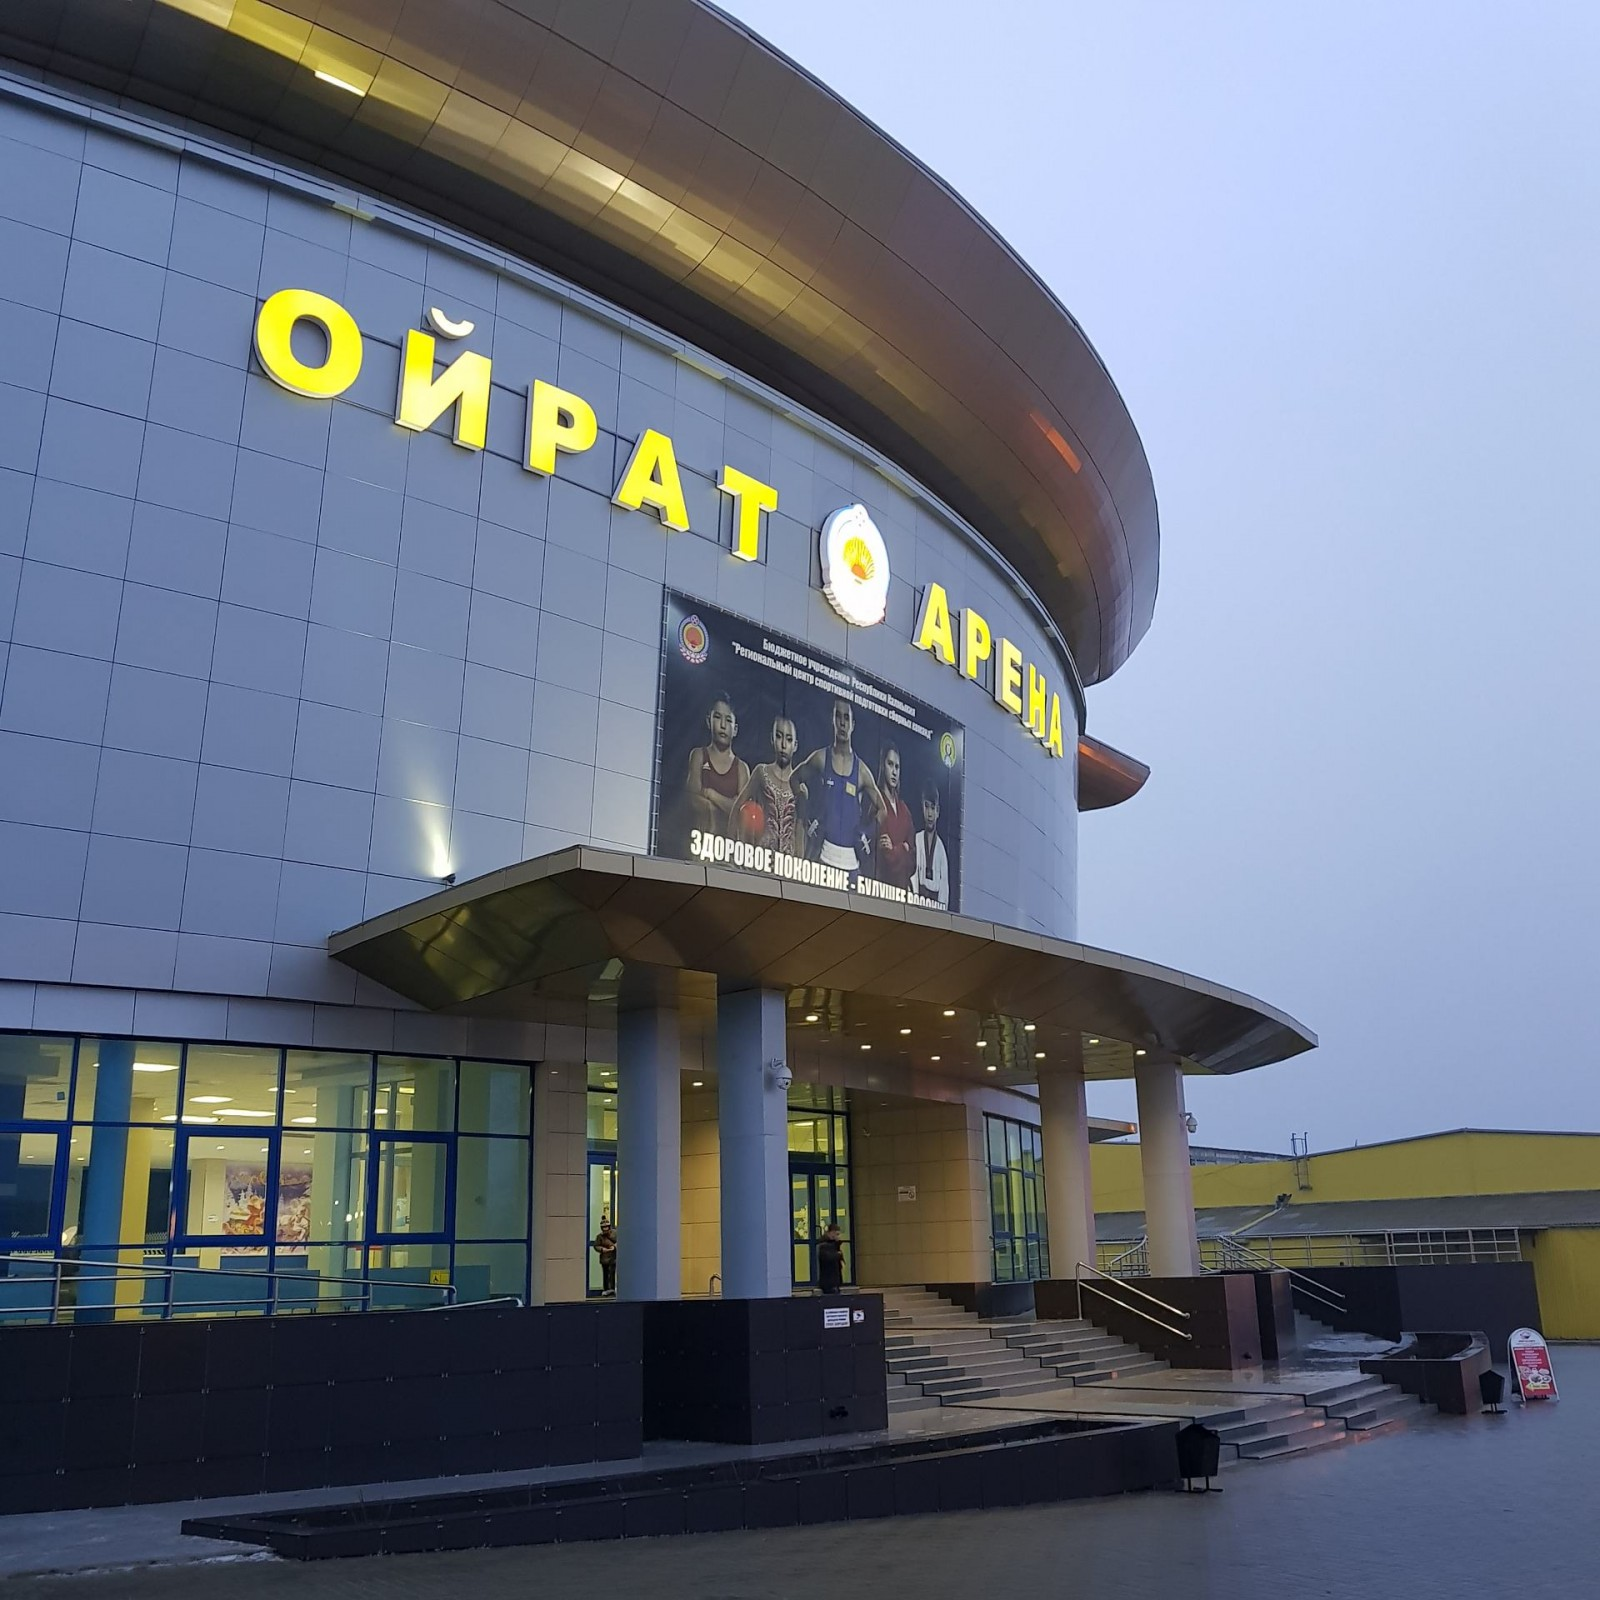 Сегодня спорткомплекс Ойрат-арена снова открыл свои двери